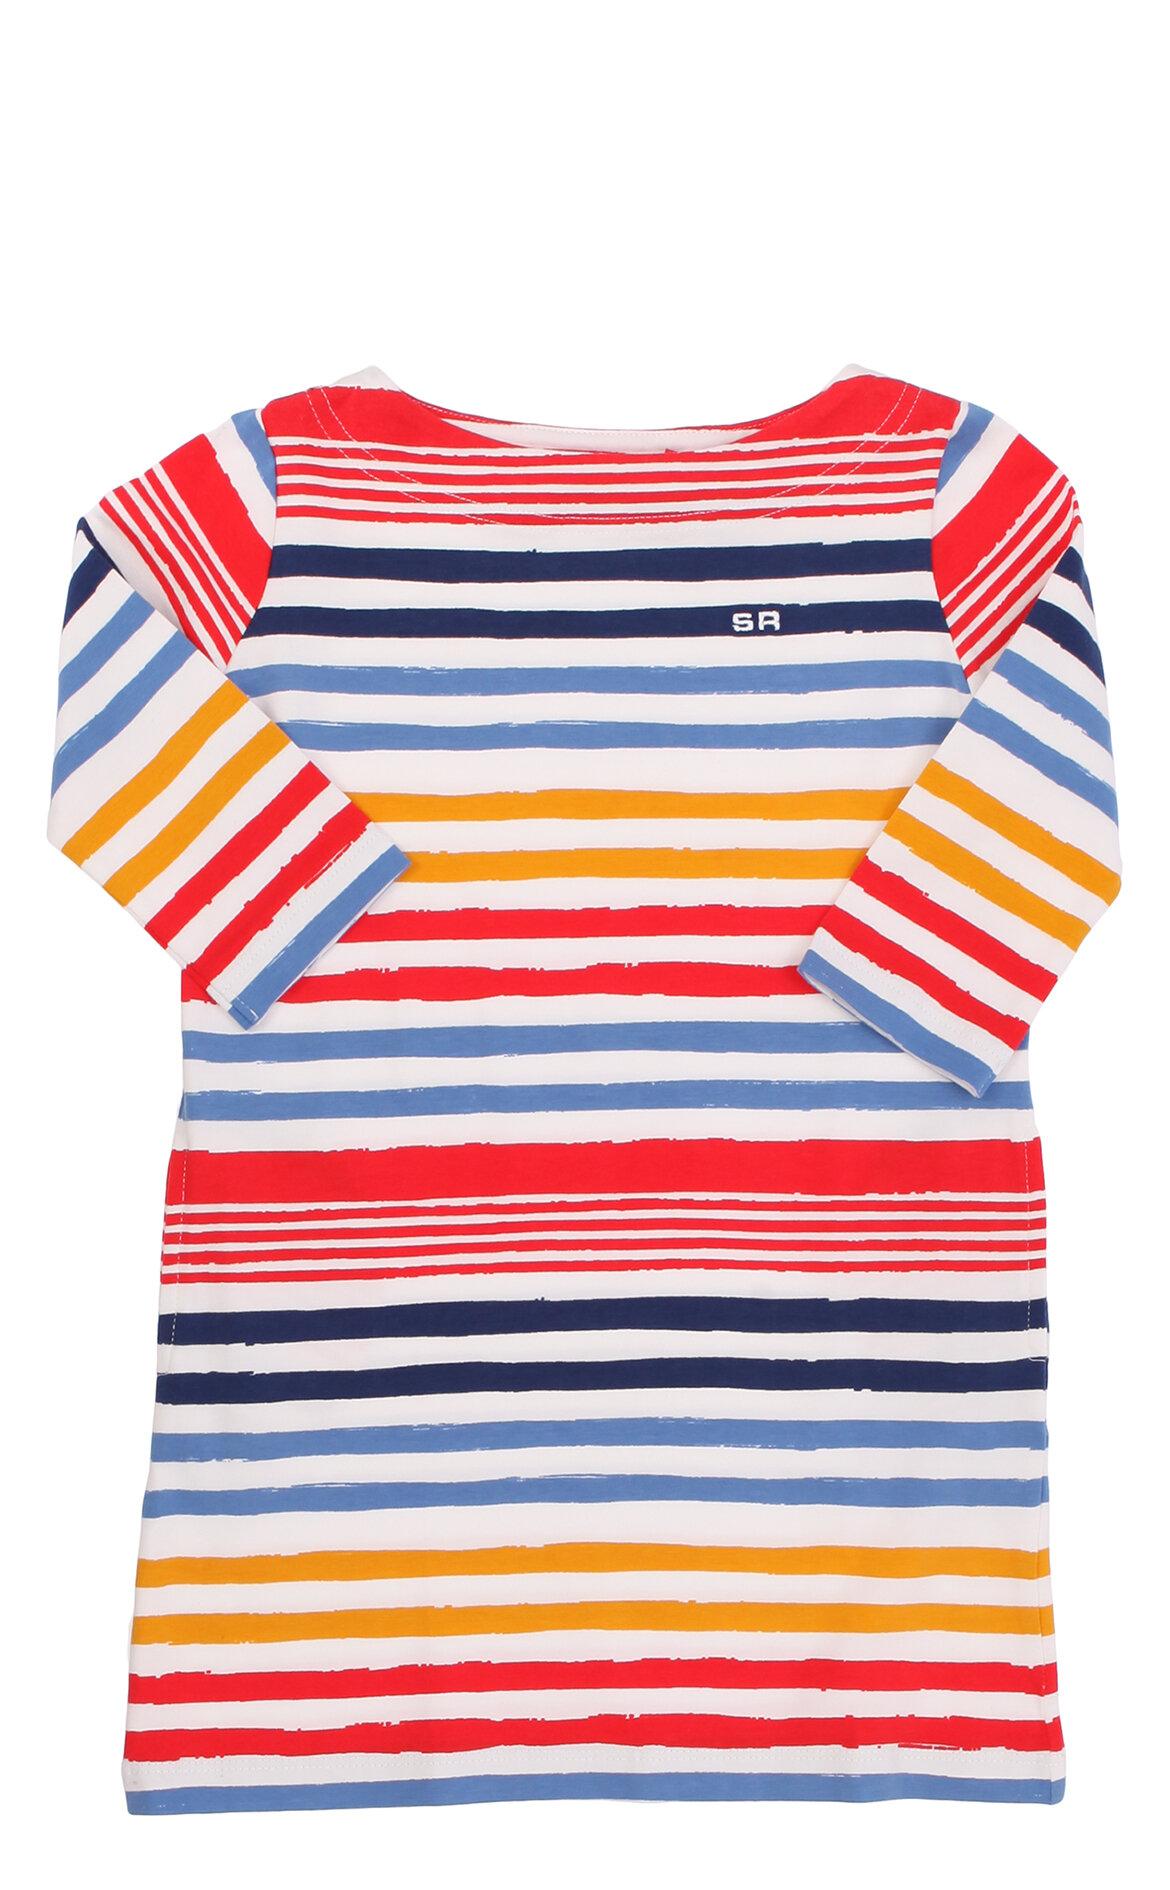 Sonia Rykiel-Sonia Rykiel Kız Çocuk Elbise